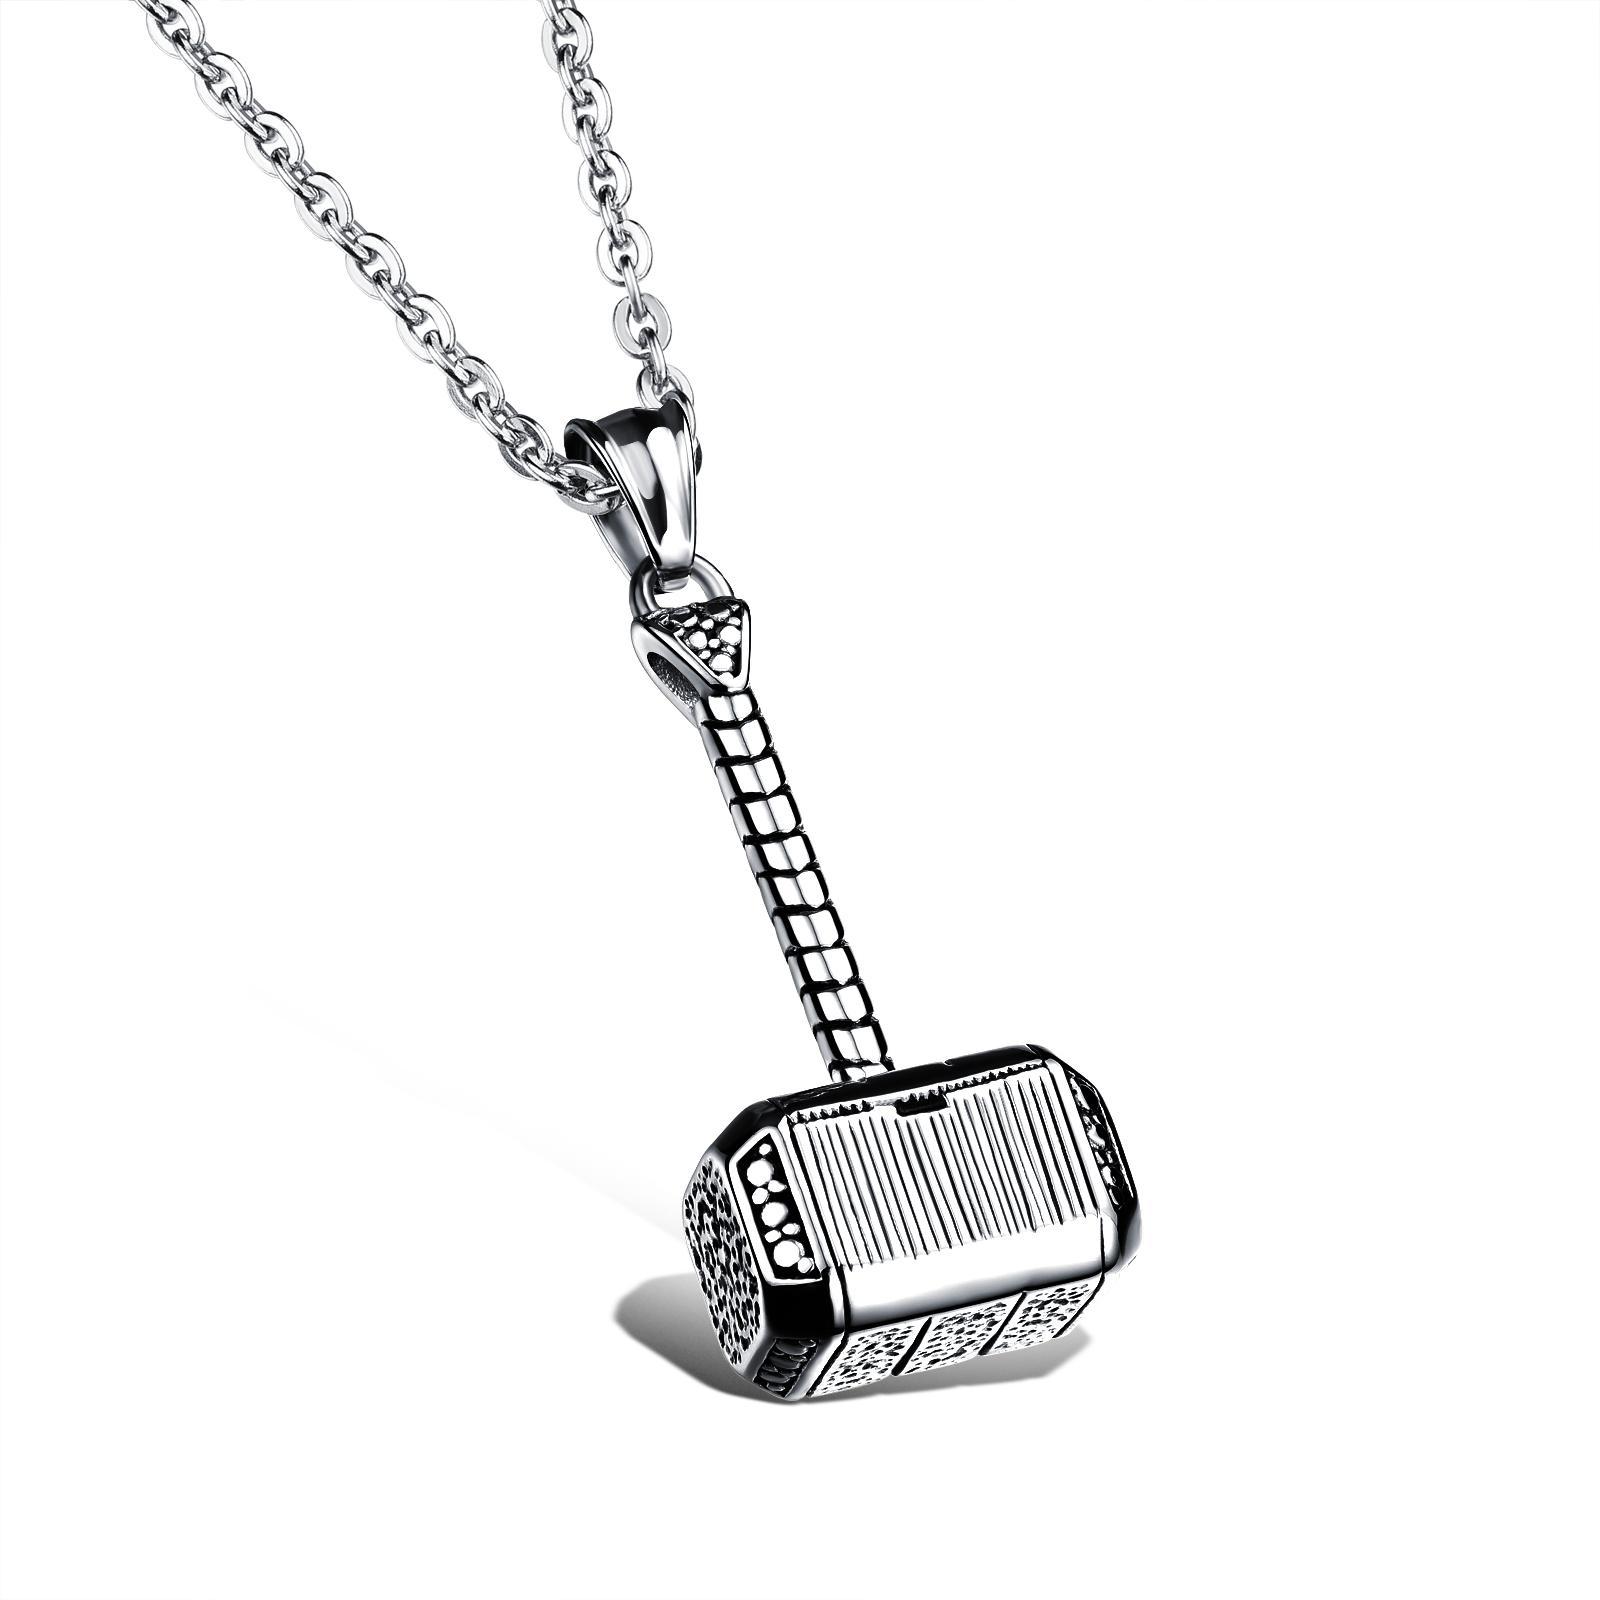 Wholesale Punk Fashion Jewelry Link Chain Cool Men S